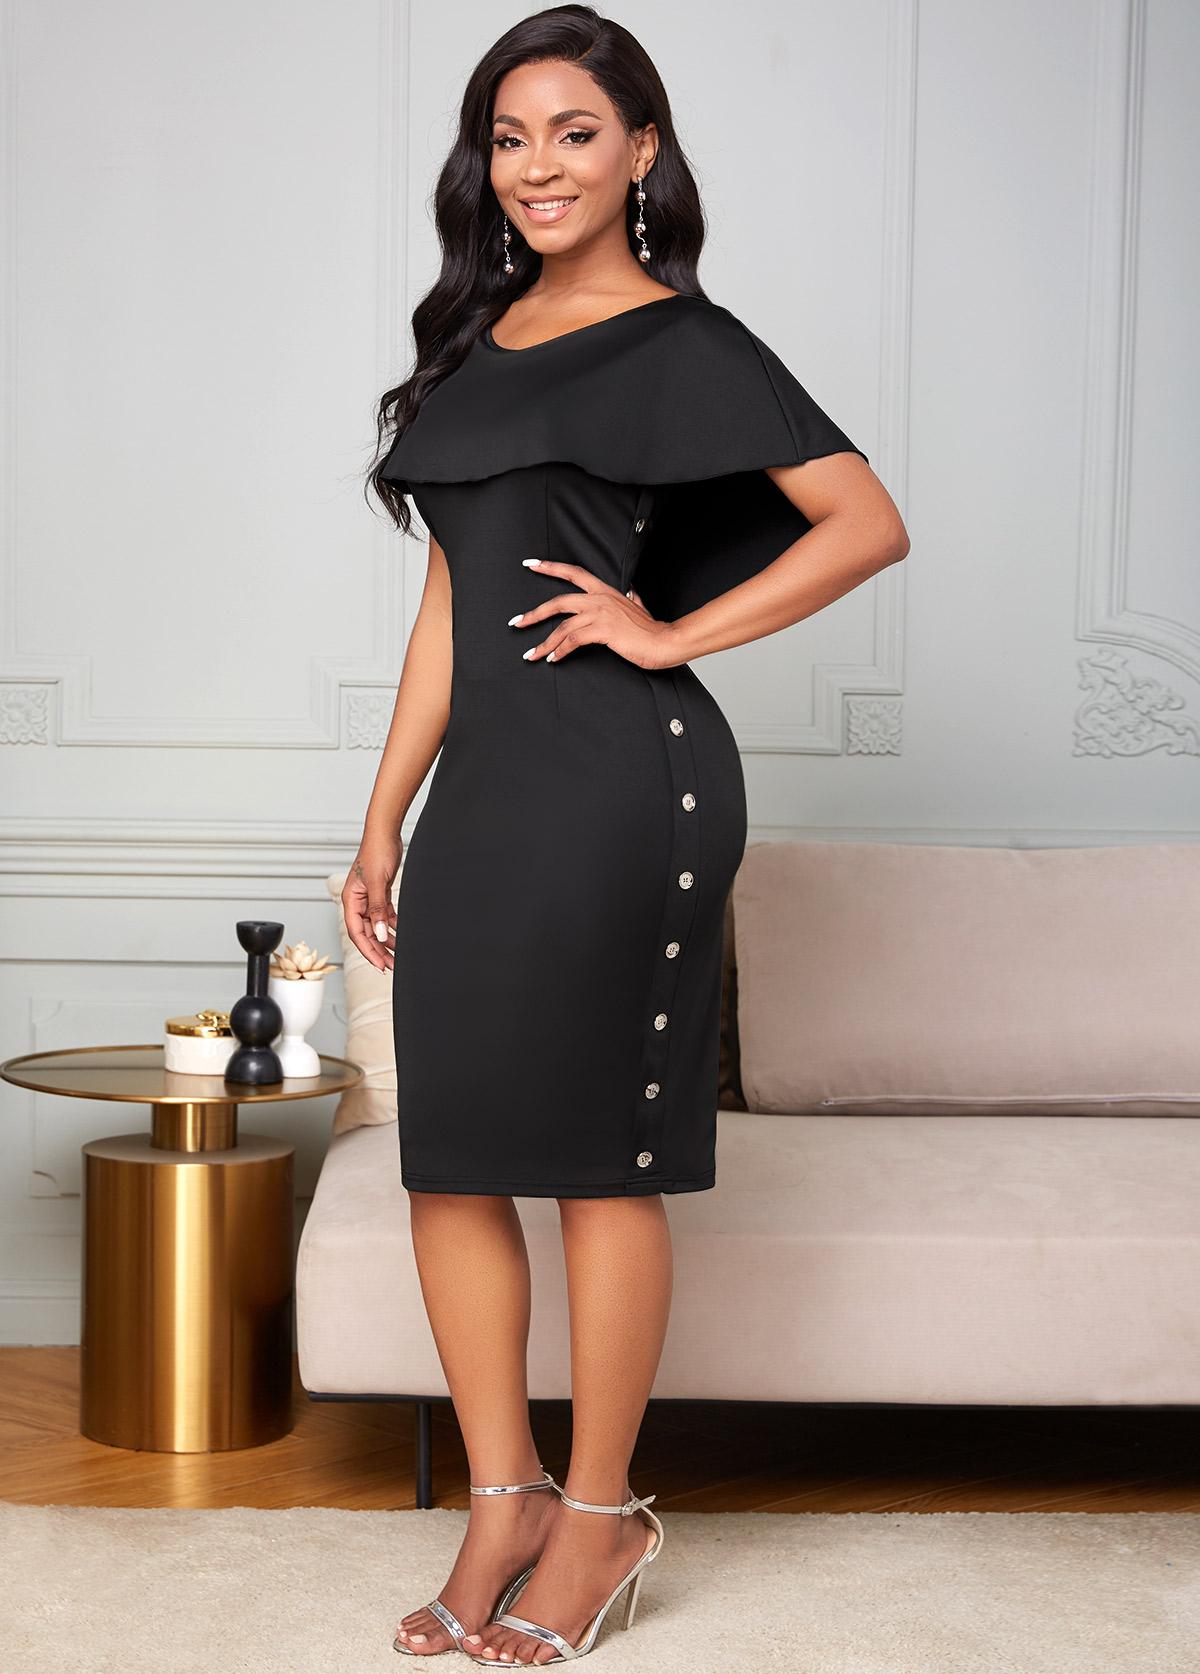 ROTITA Ruffle Overlay Inclined Button Bodycon Dress